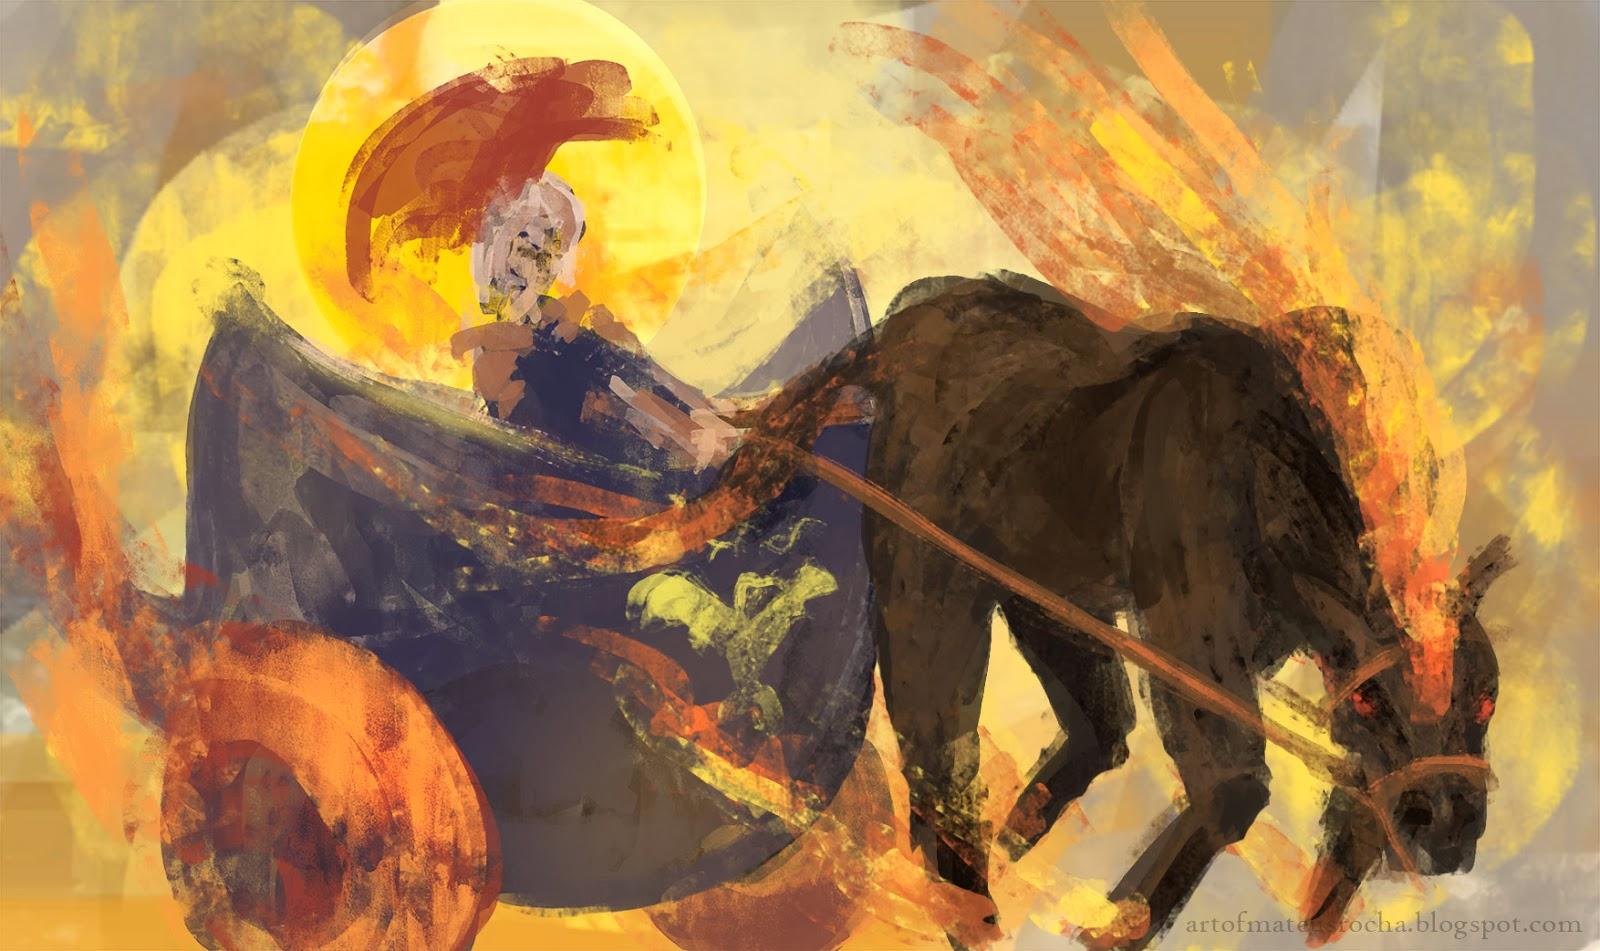 Pubg By Sodano On Deviantart: The Art Of Mateus Rocha: November 2013